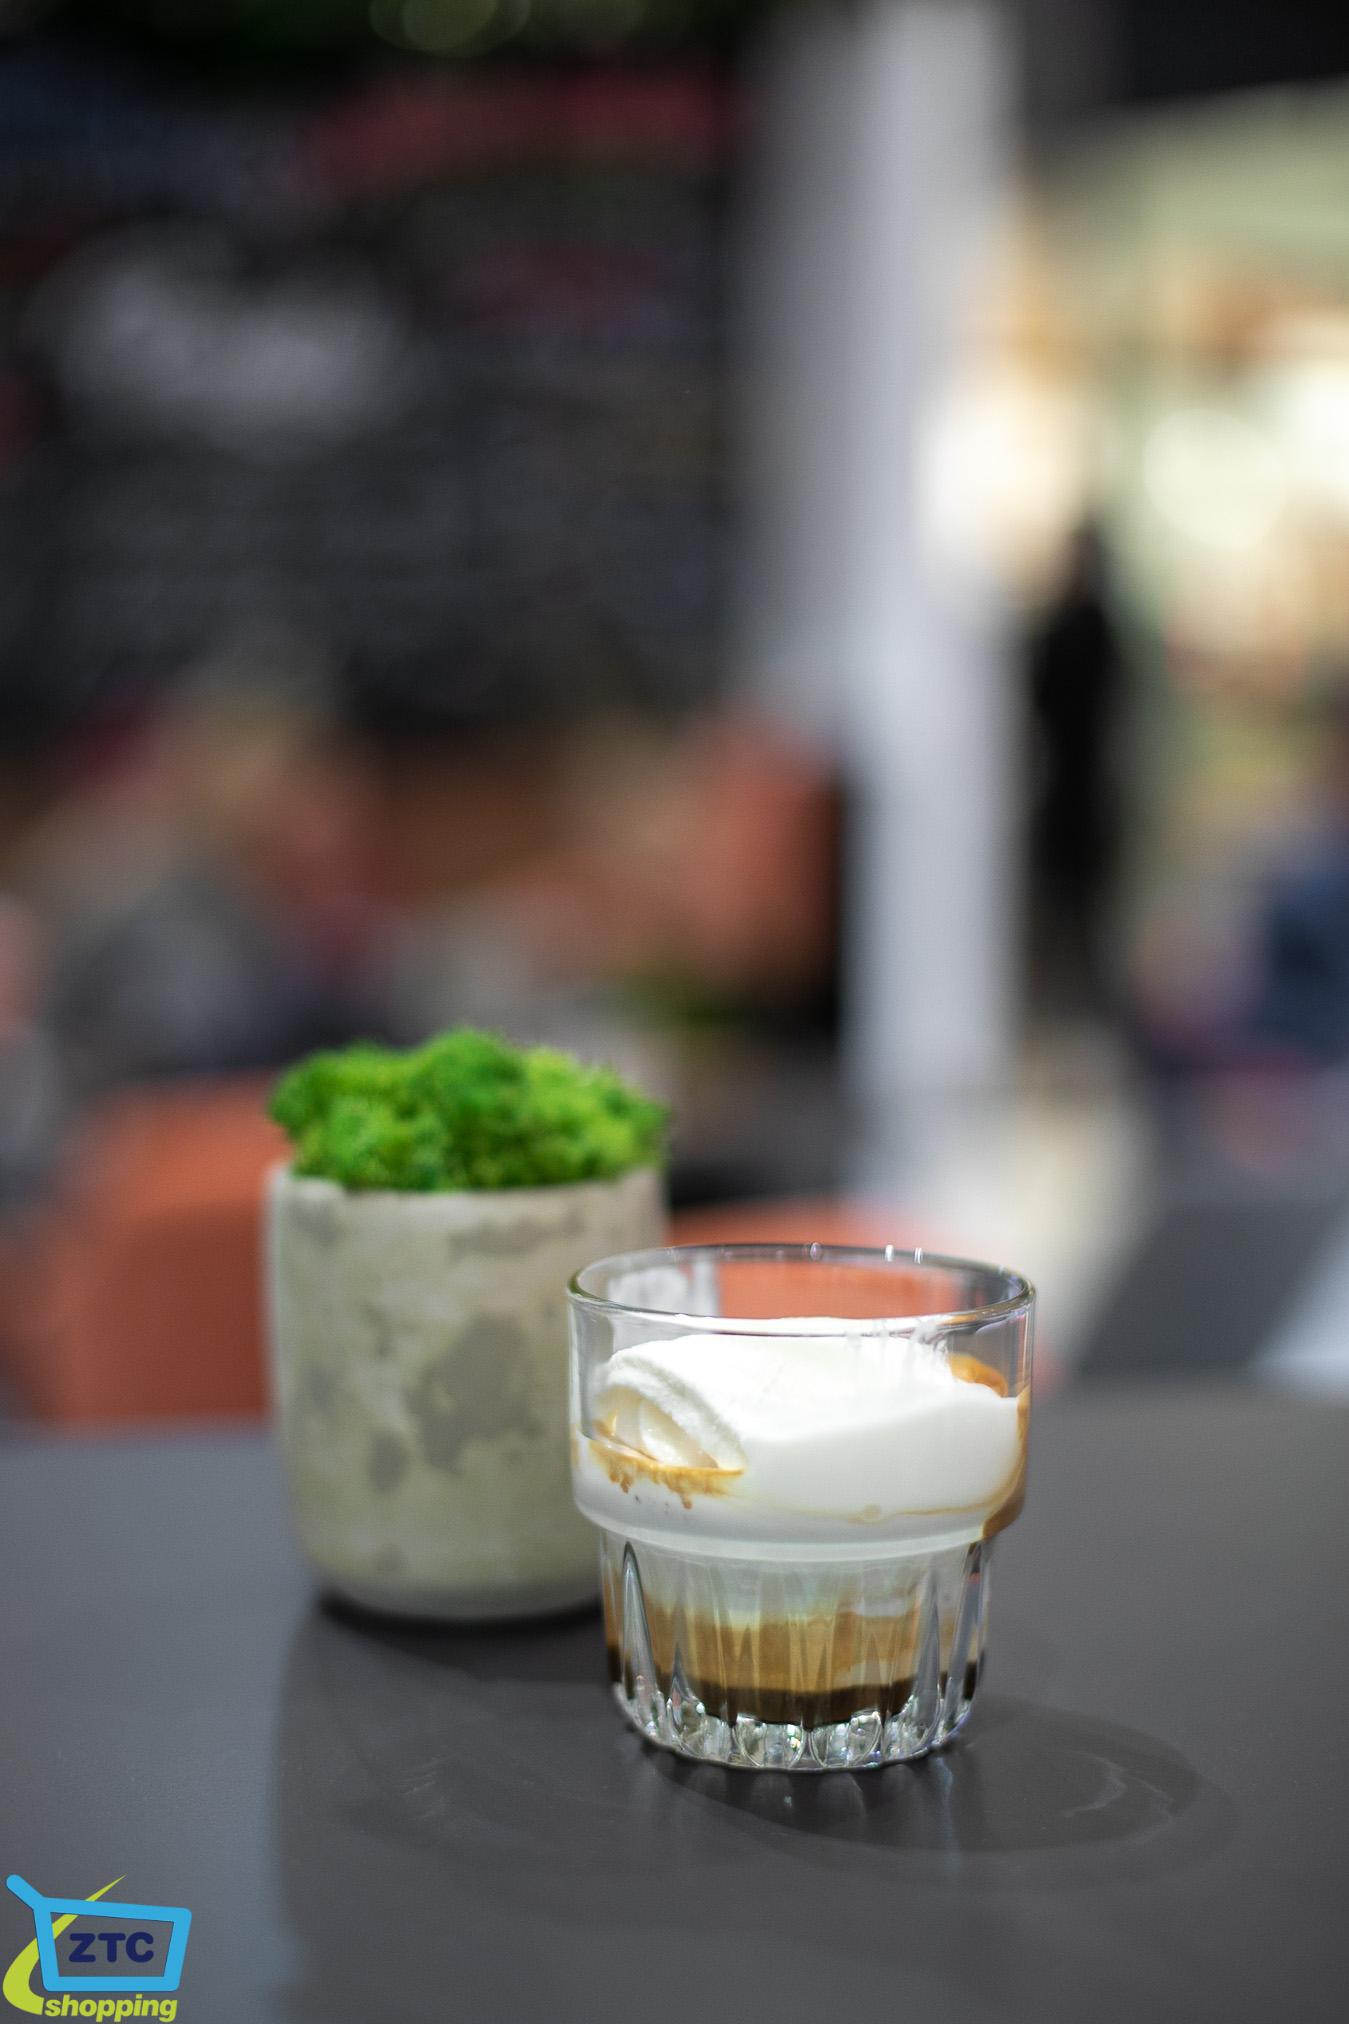 Otvoren novi lokal u ZTC-u: Caffe Latte Boutique!